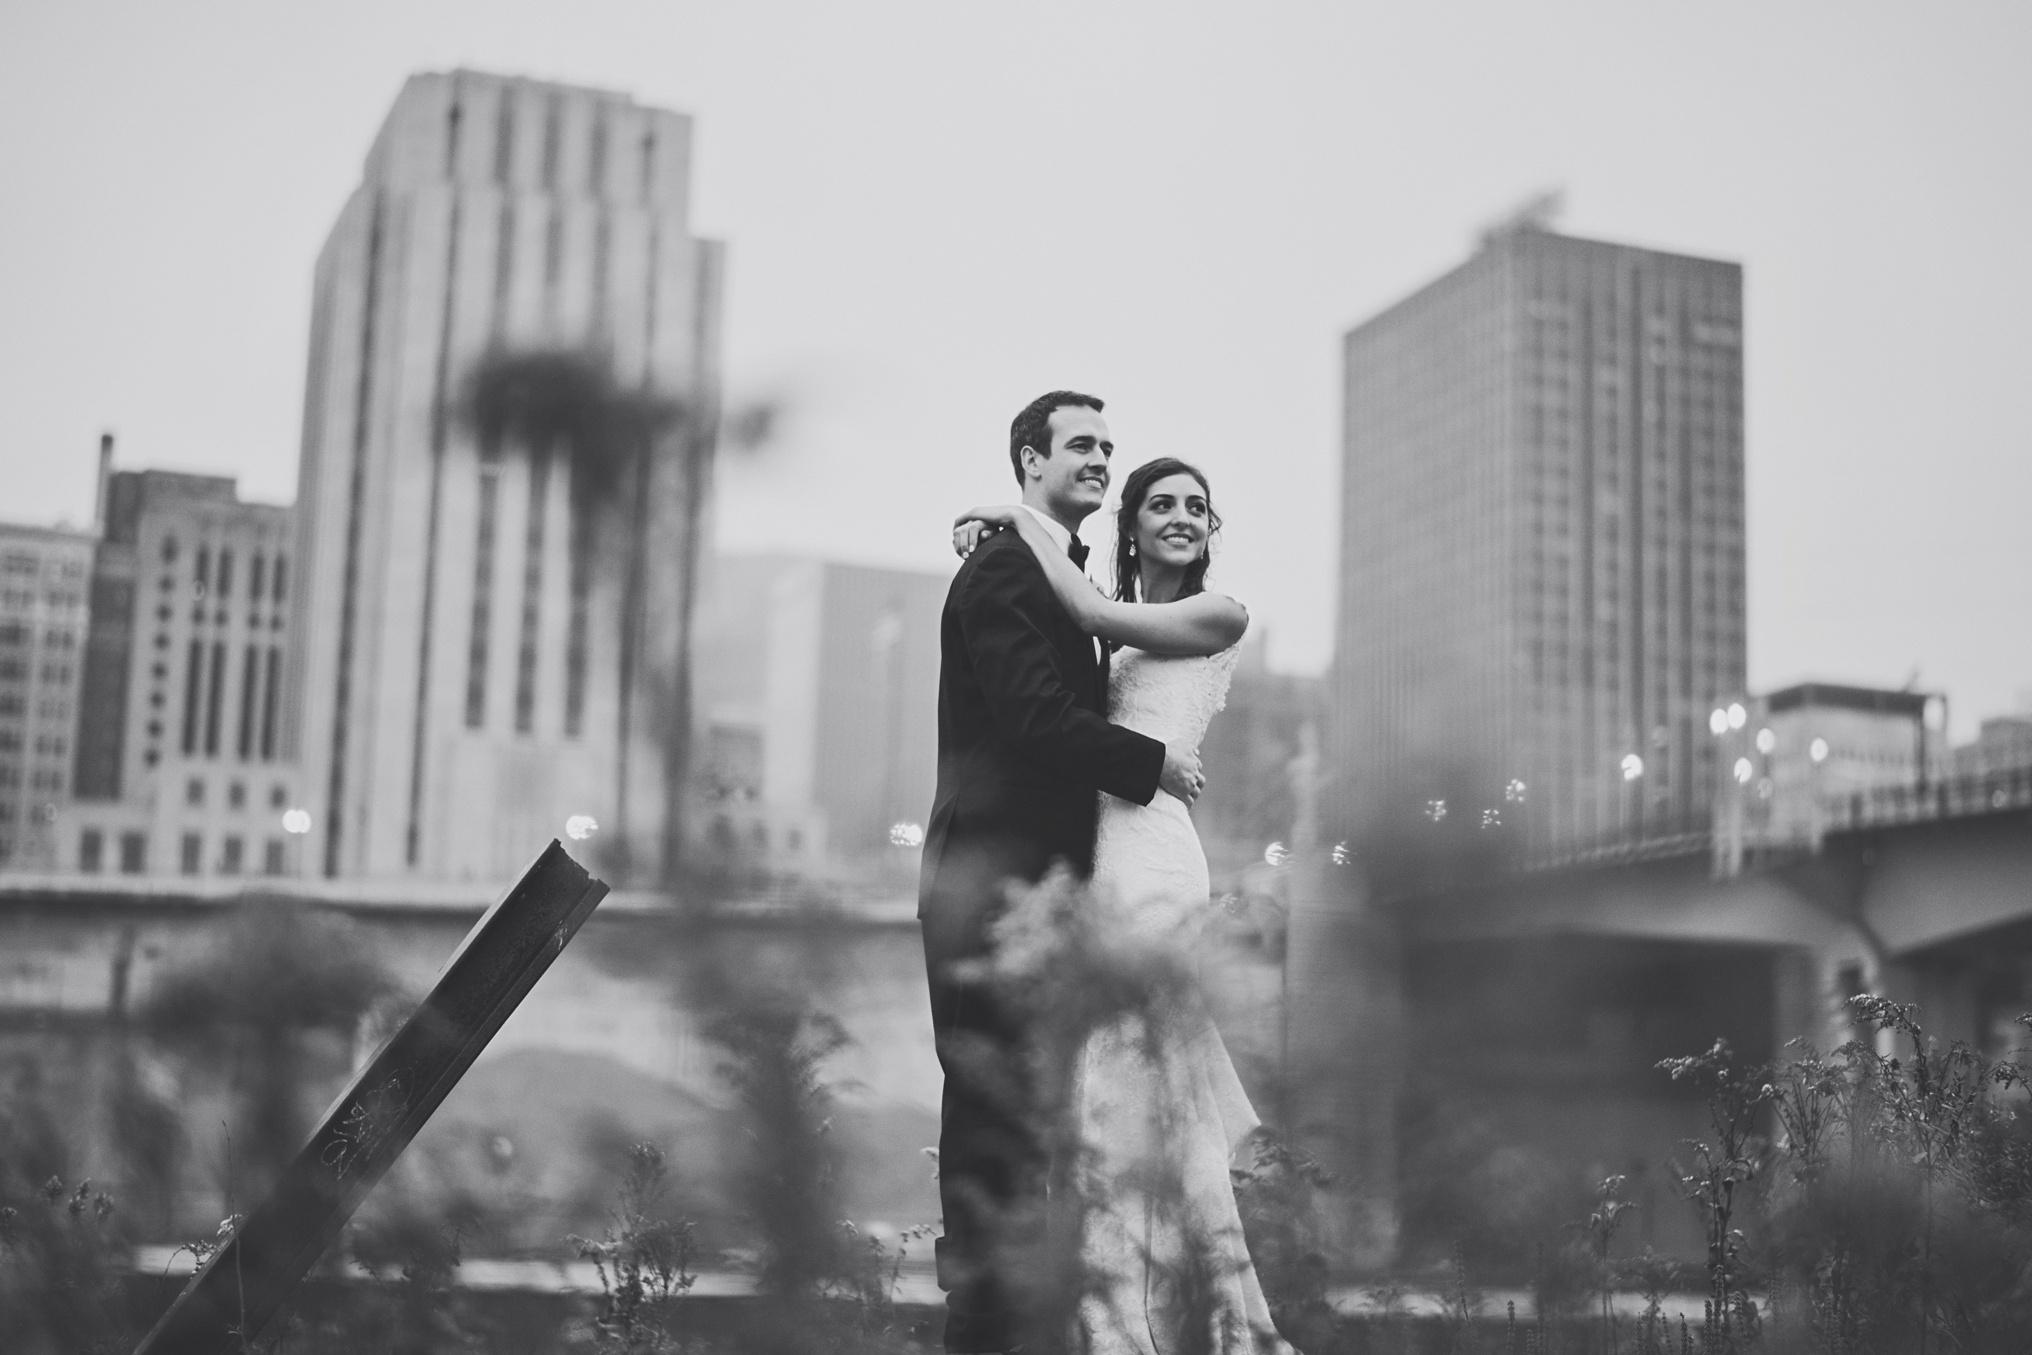 best_wedding_photography_2017_by_lucas_botz_photography_059.jpg